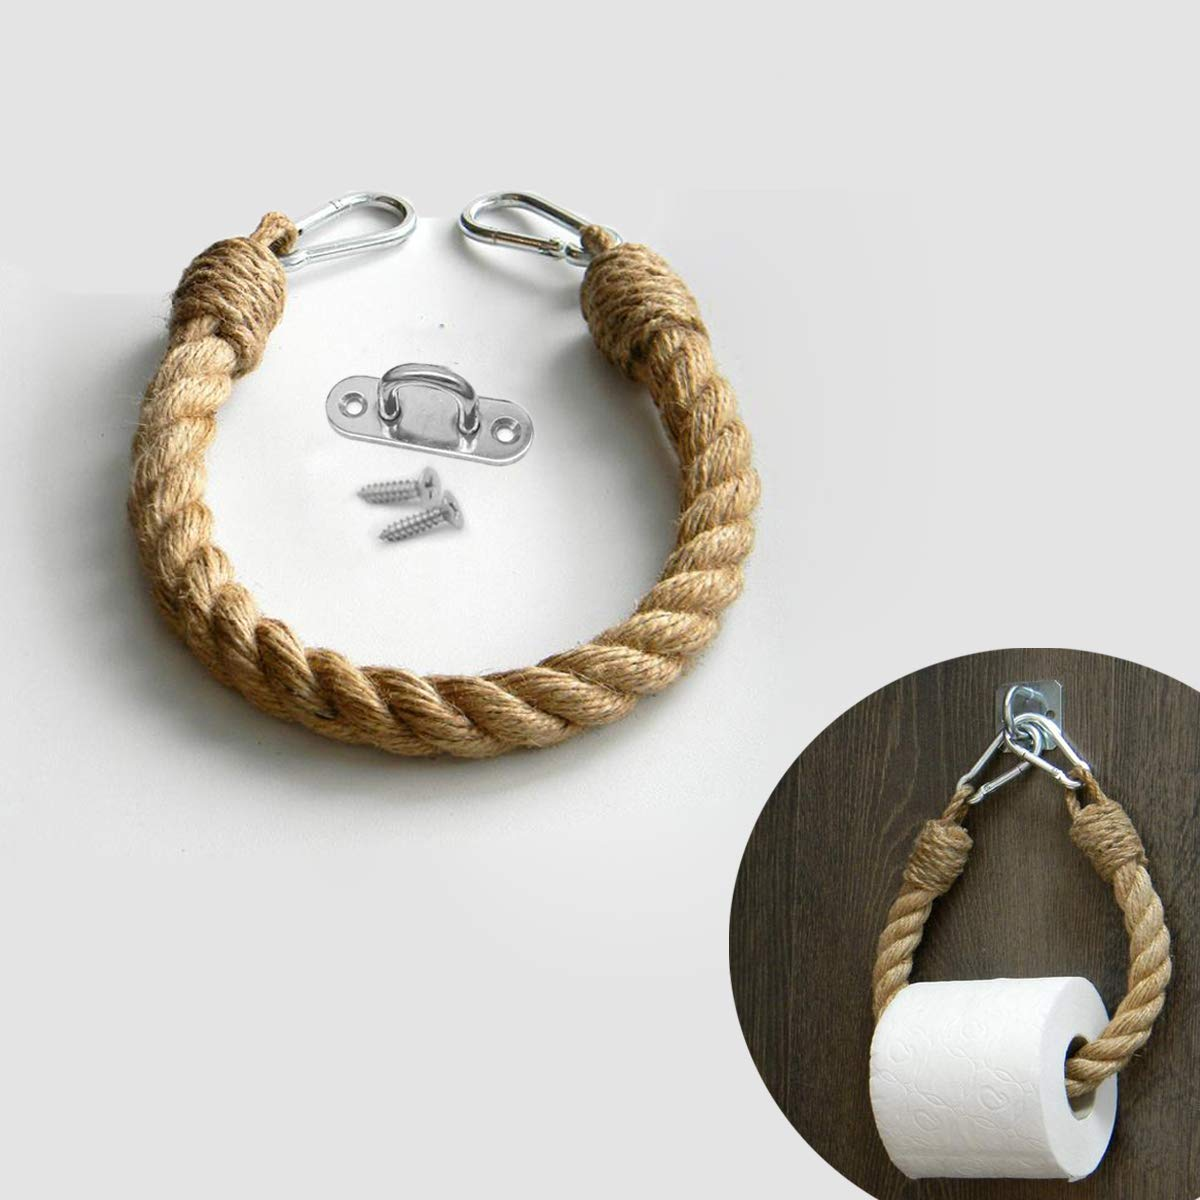 EBINGMIMA Nautical Rope Toilet Paper Holder Bathroom Decor (Jute Rope, 50cm/19.7inches): Amazon.in: Home & Kitchen